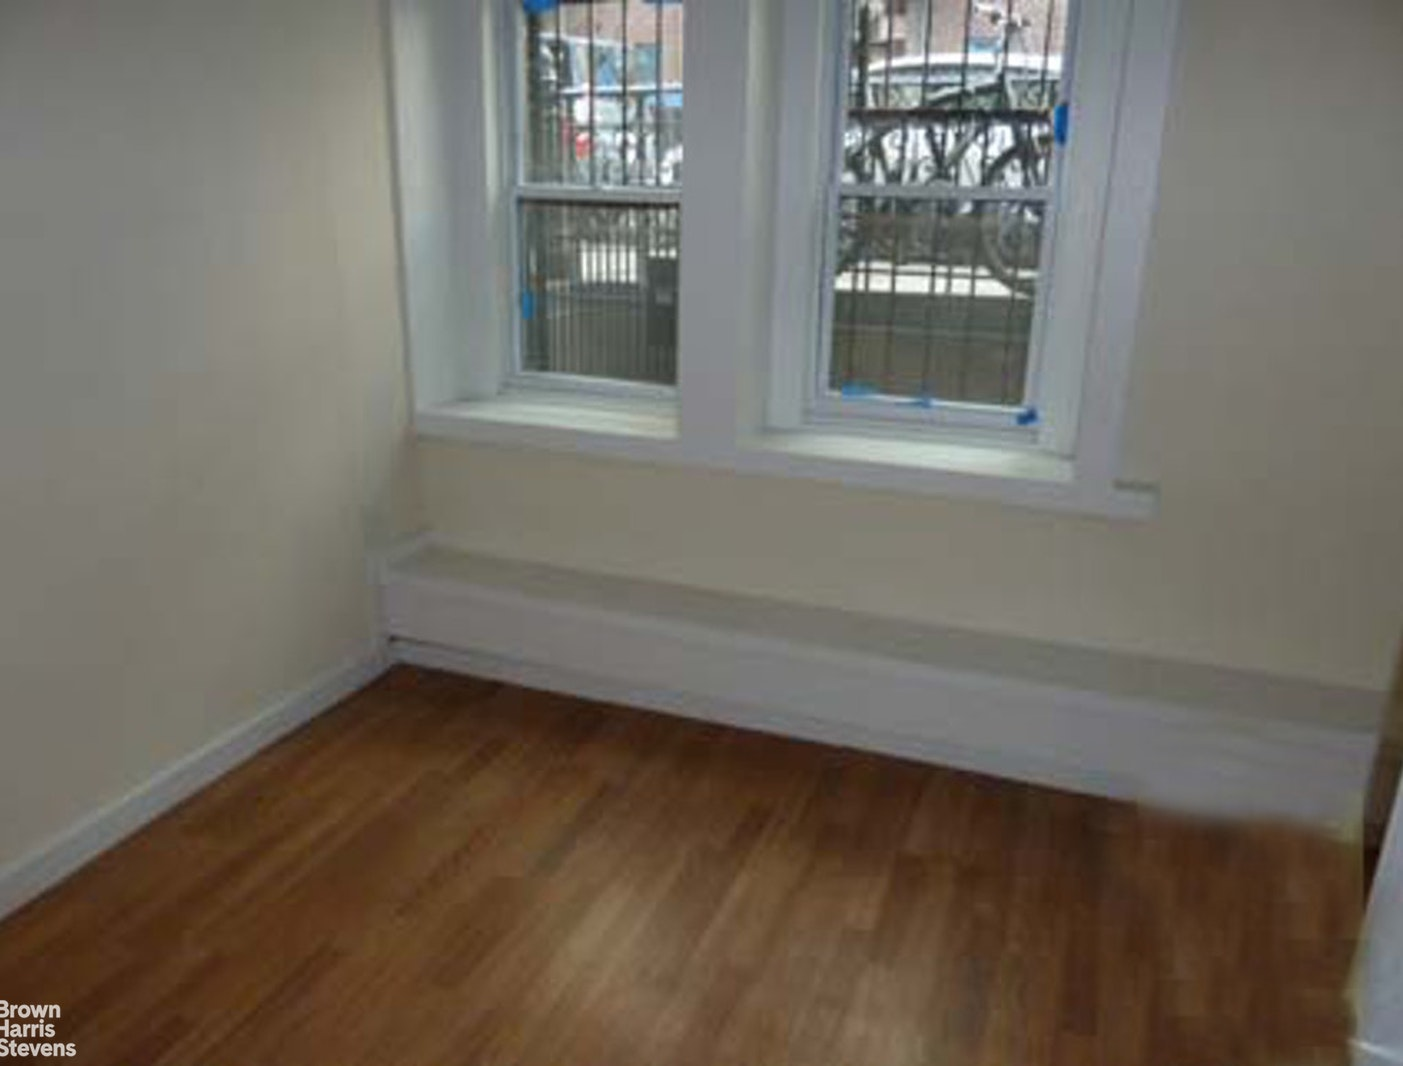 630 EAST 9TH STREET BW, East Village, $2,800, Web #: 19710655